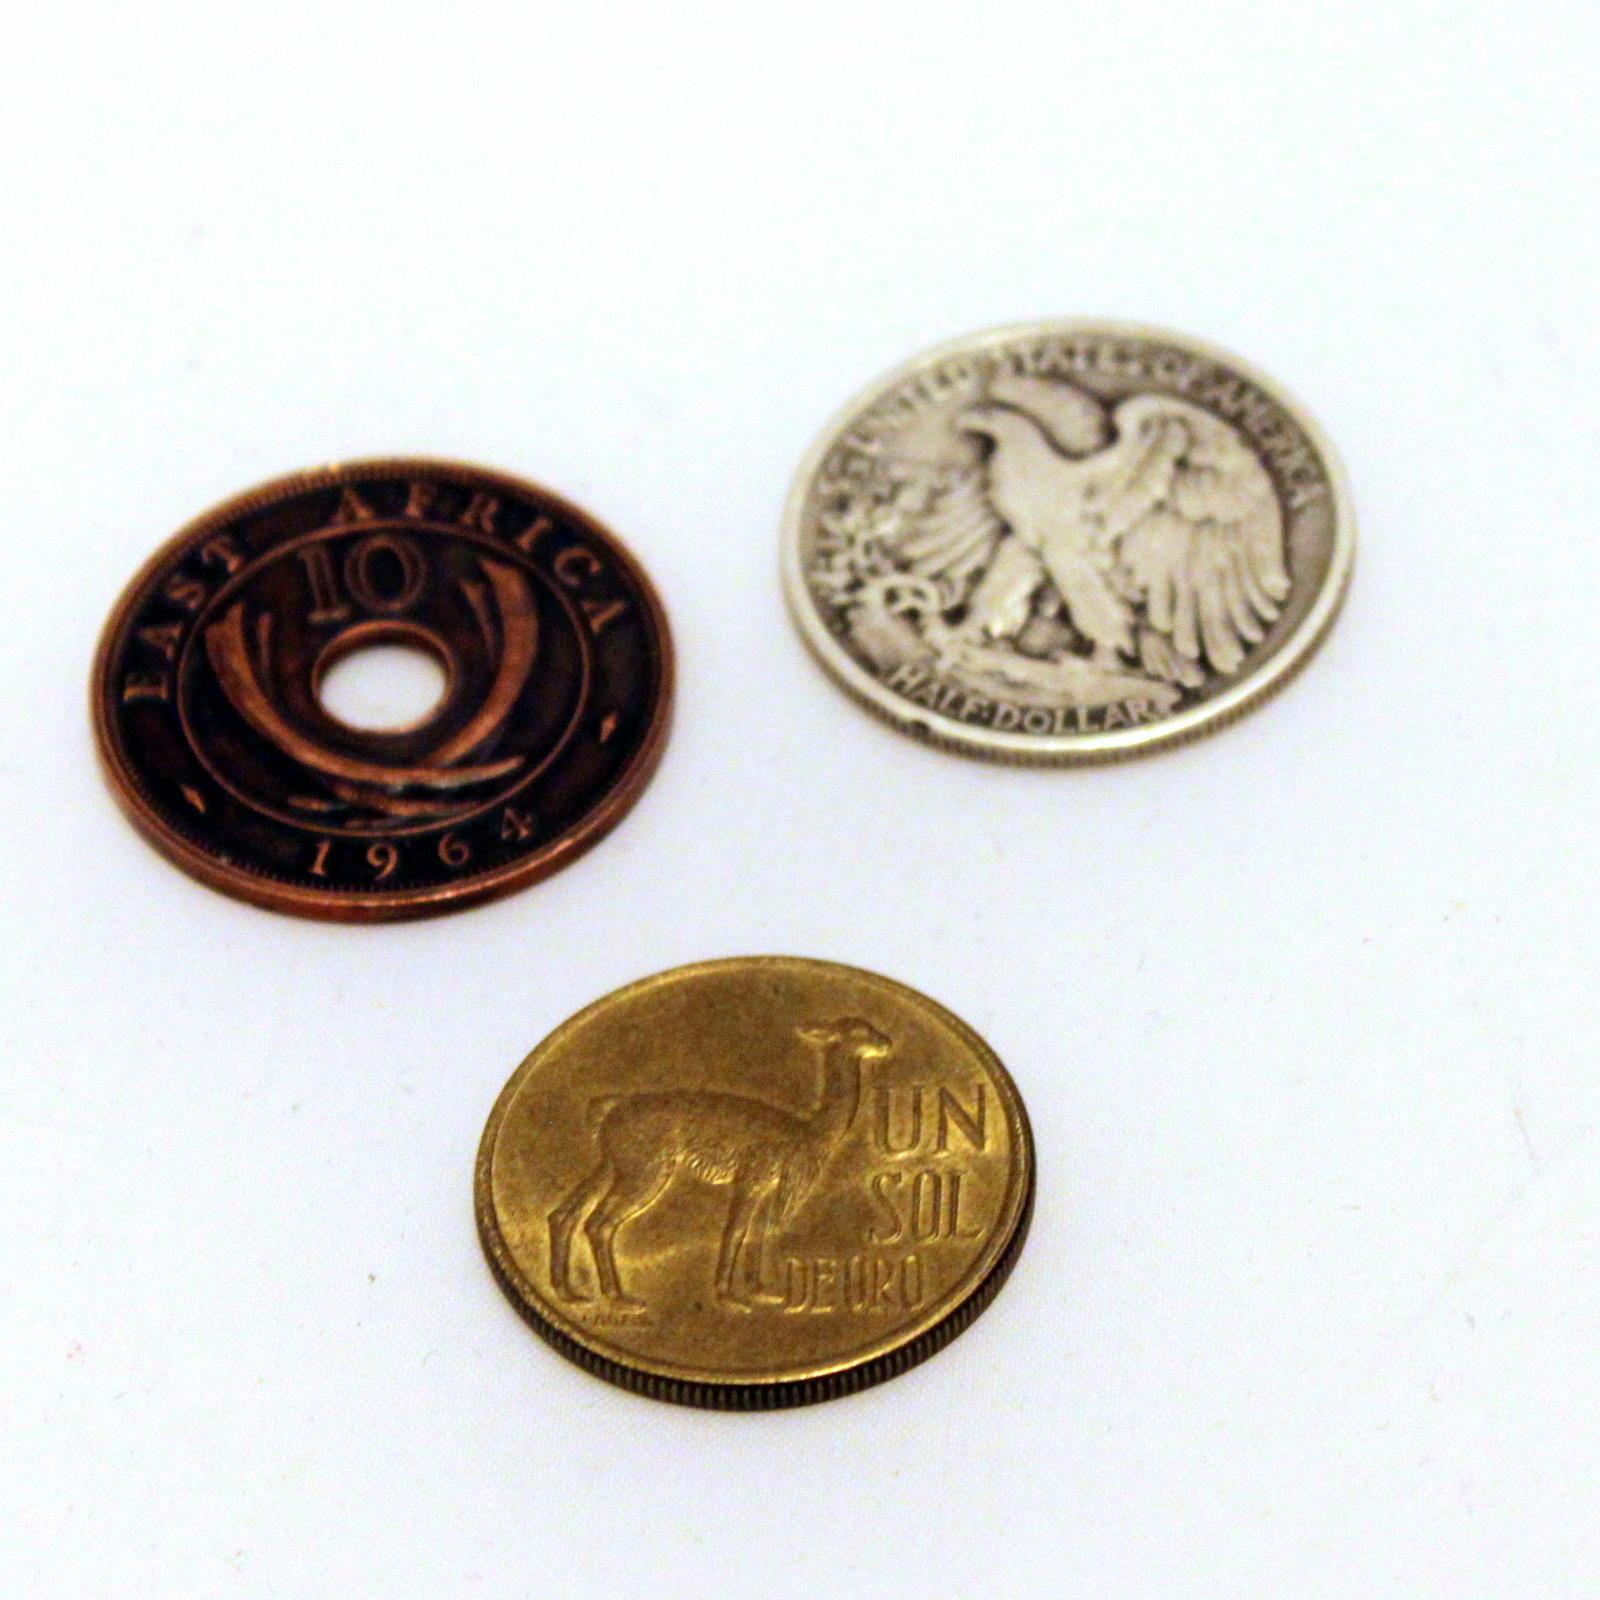 Copper, Sliver, Brass, Transpo (Schoolcraft) by Jamie Schoolcraft